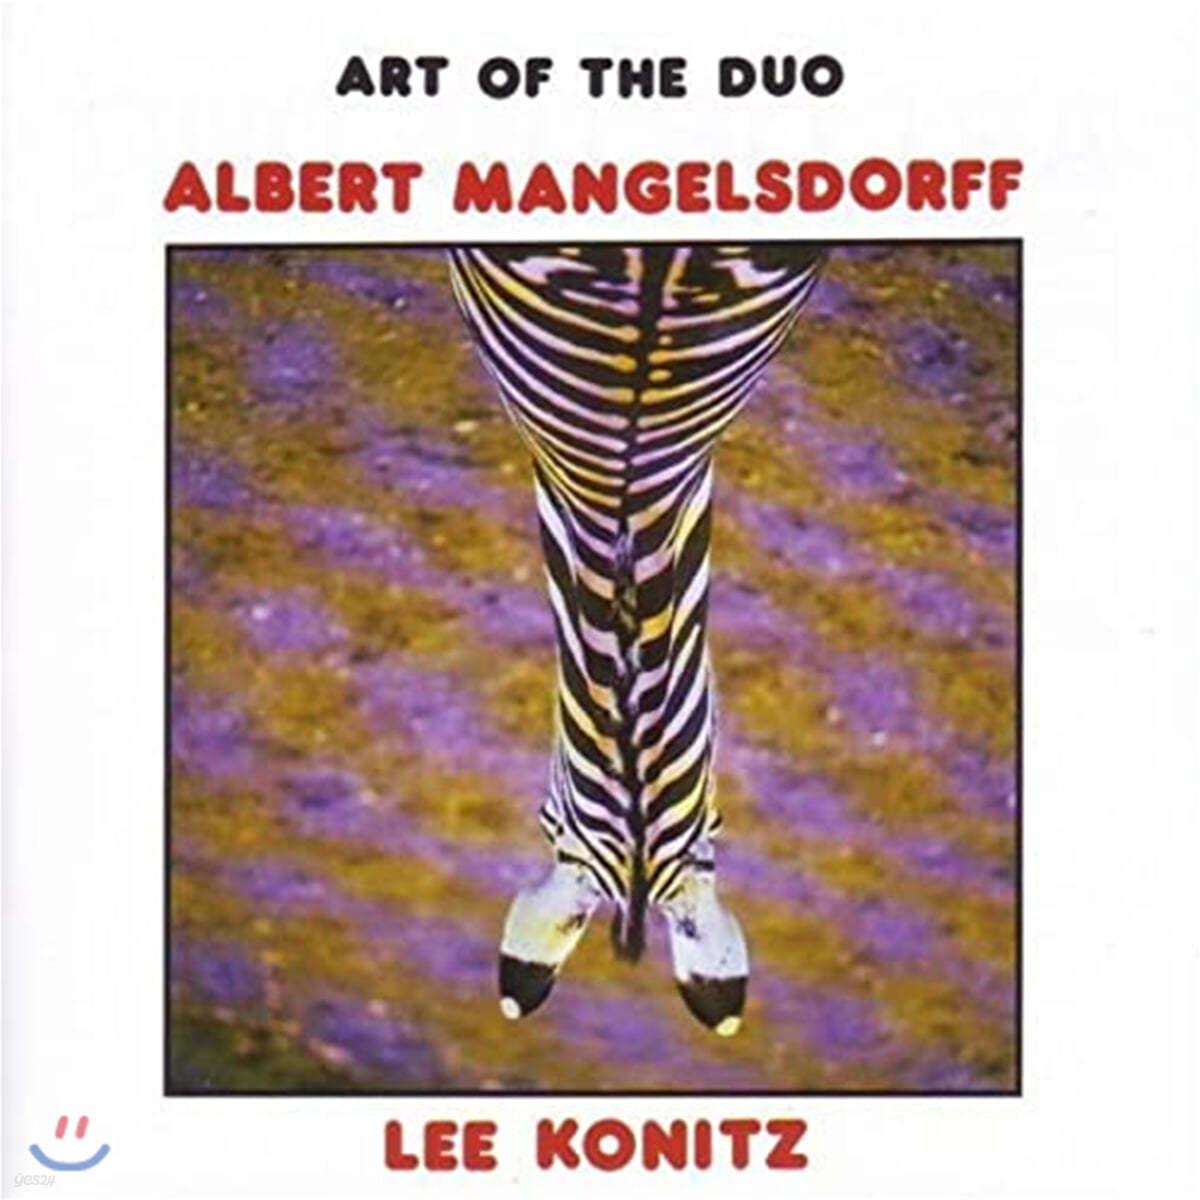 Albert Mangelsdorff / Lee Konitz (알버트 만겔스도르프 / 리 코닛츠) - Art Of The Duo